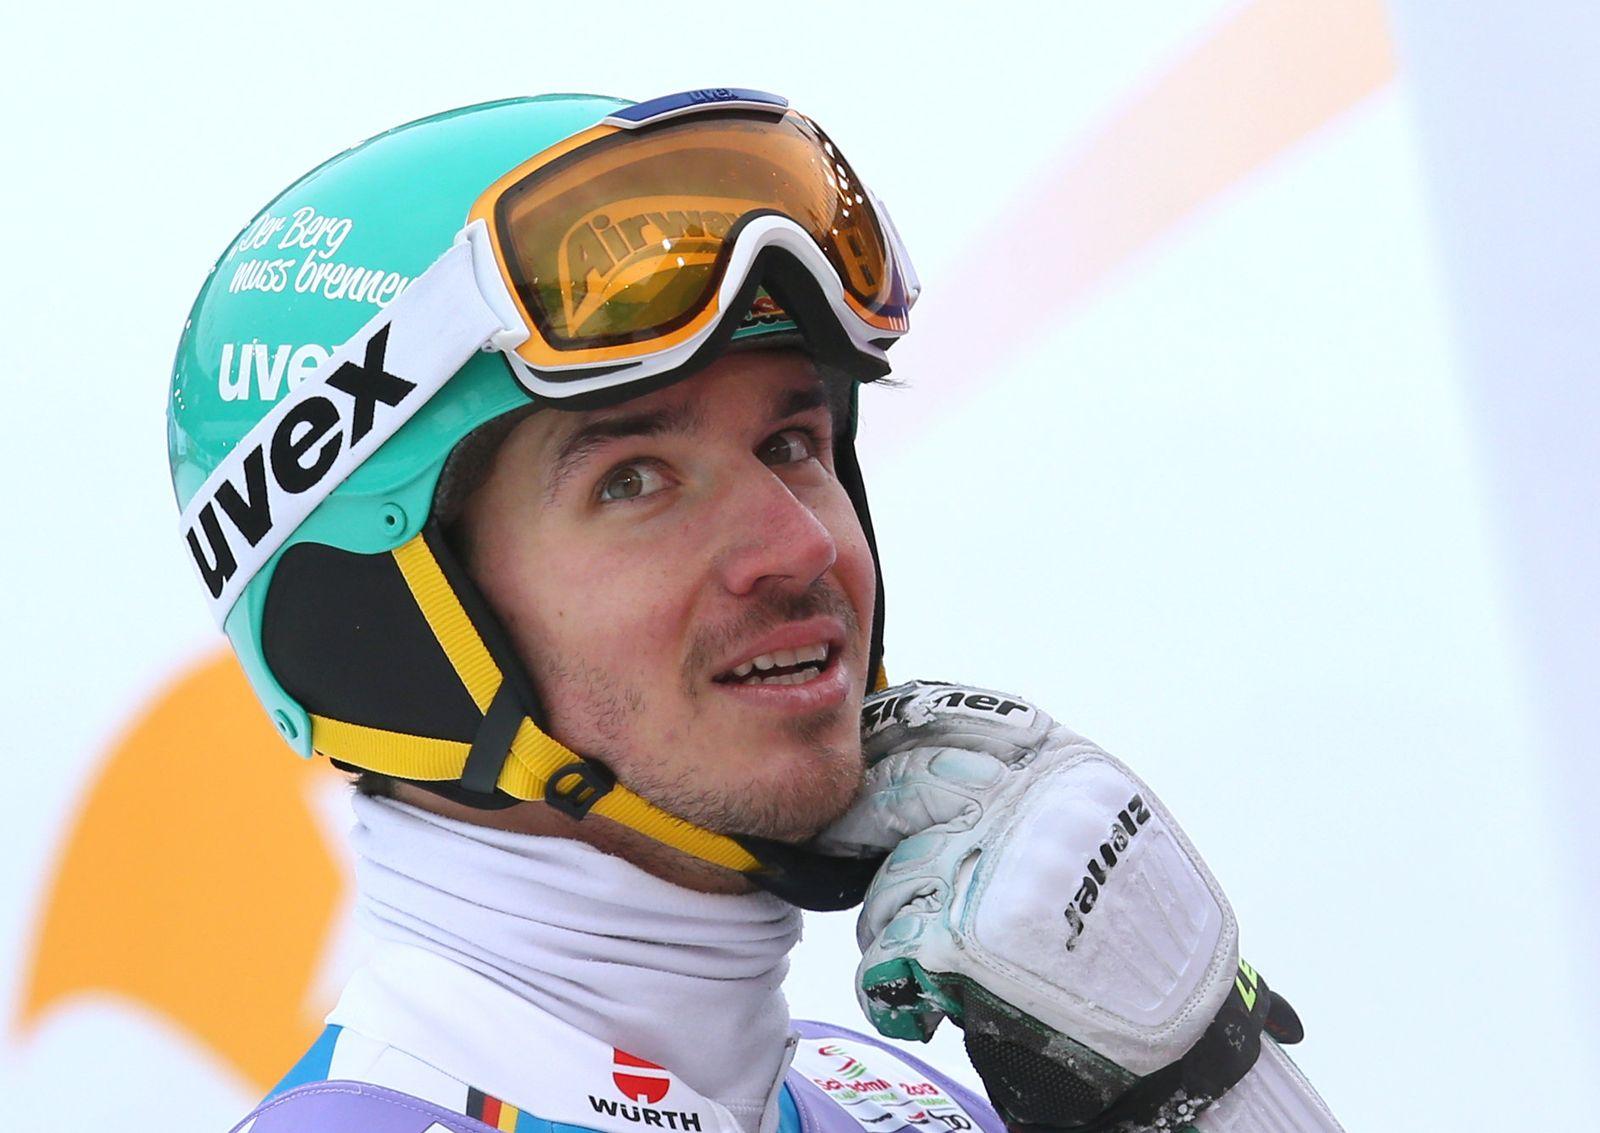 Sotschi 2014 - Felix Neureuther